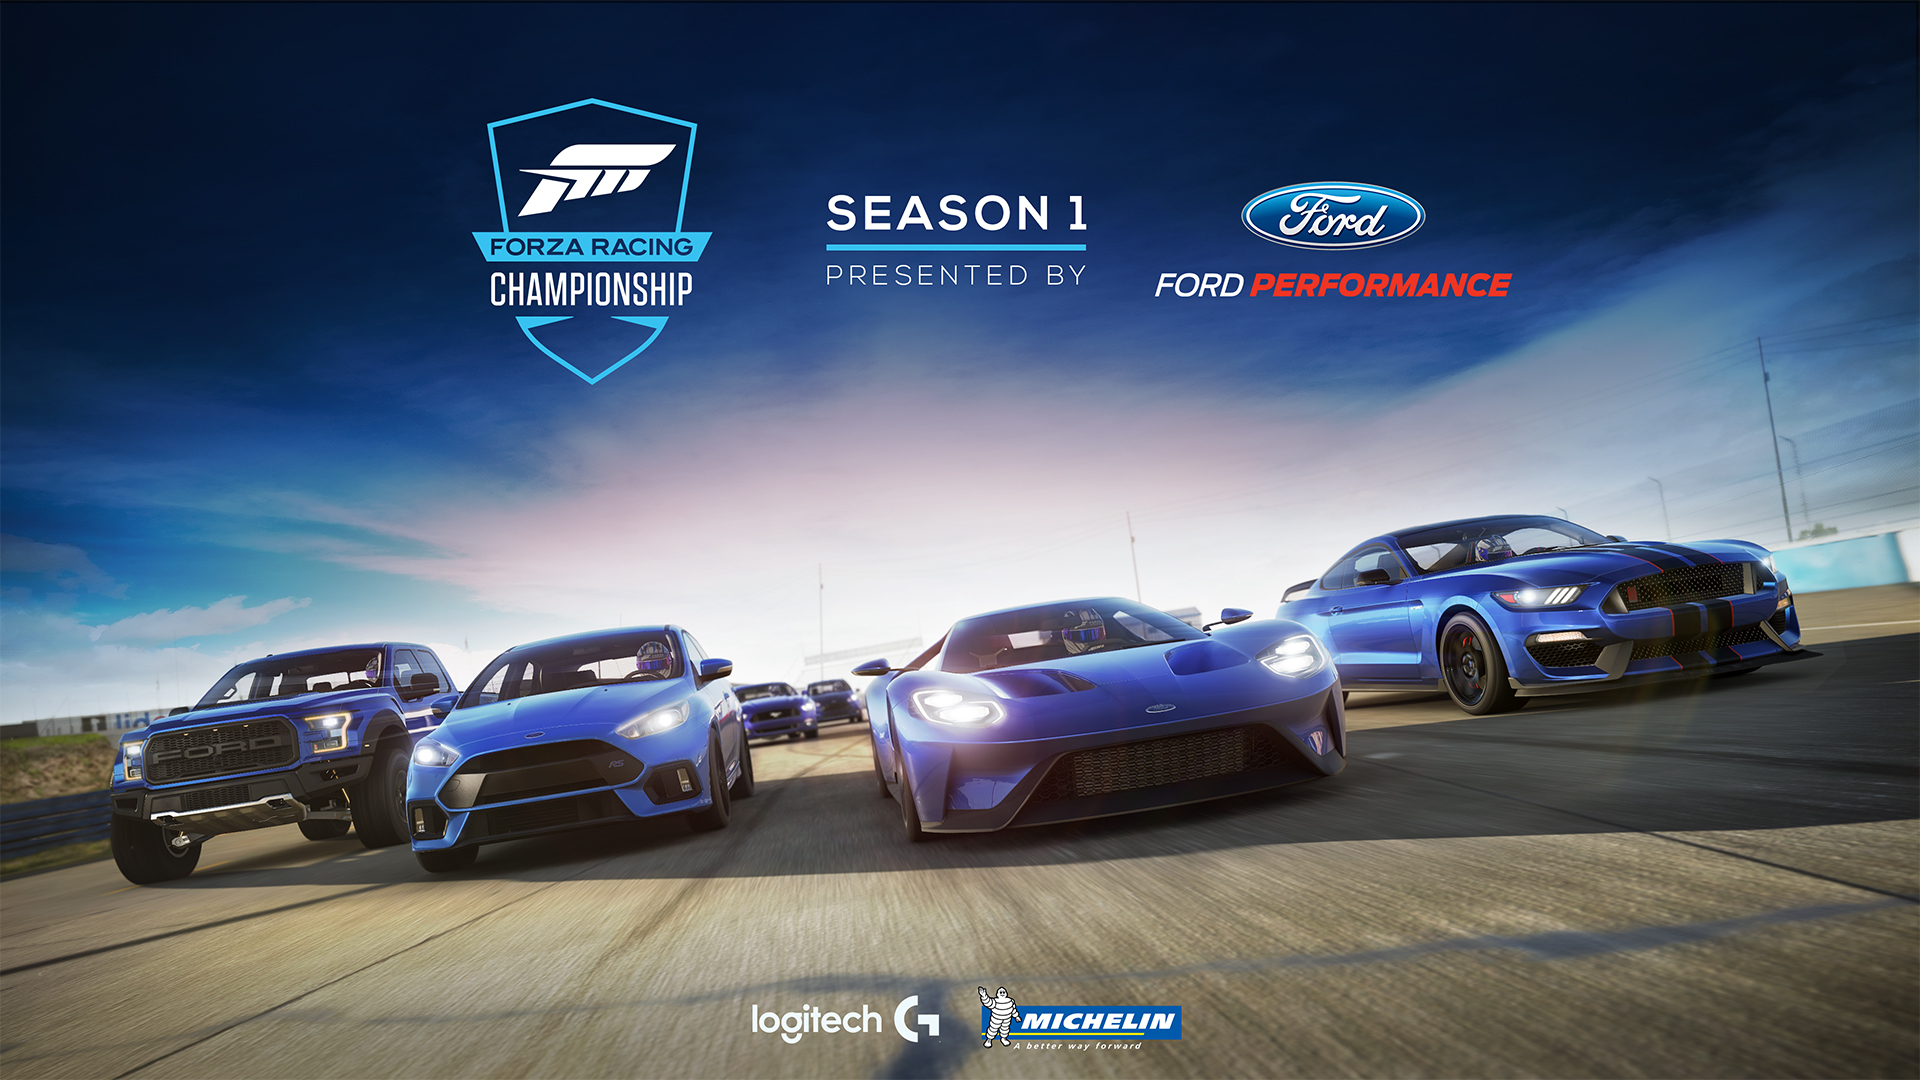 Forza racing championship season 1